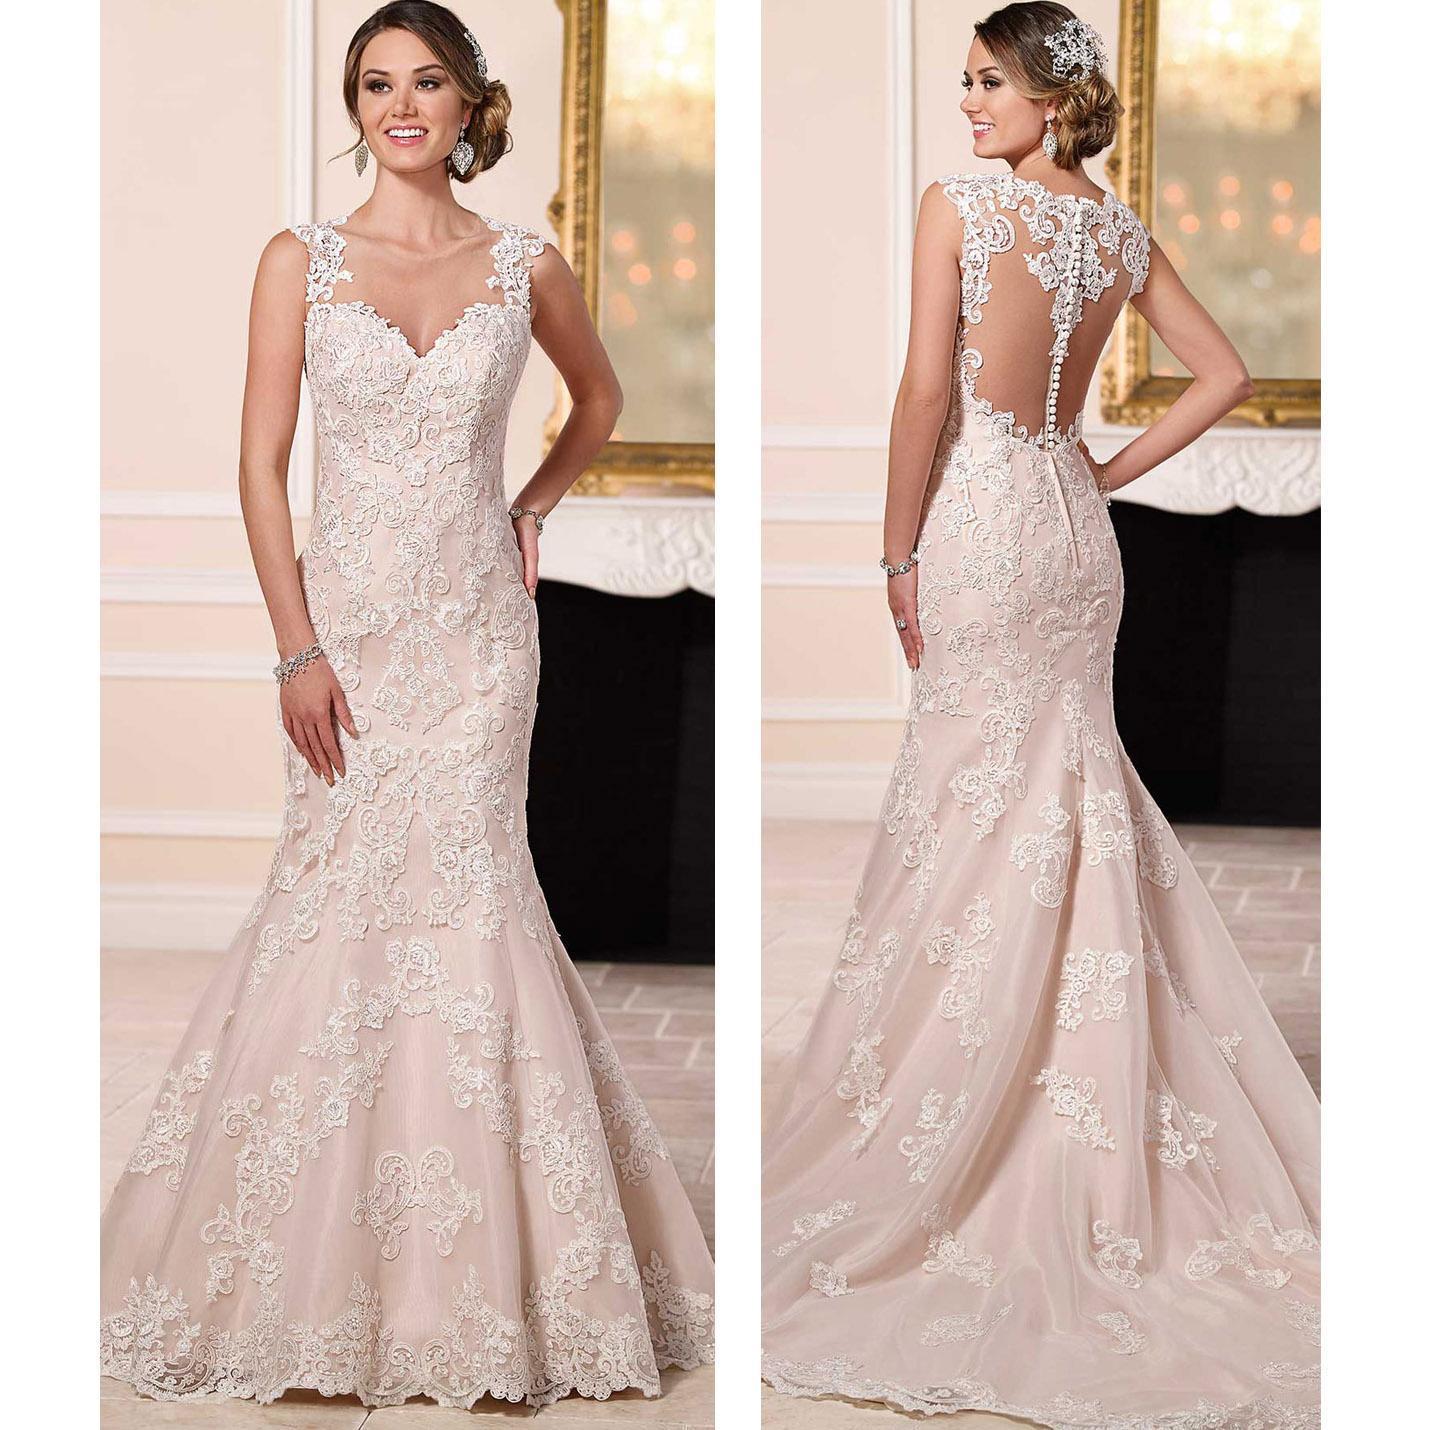 Stella york sexy lace wedding dresses 2016 mermaid for Dhgate wedding dresses 2016